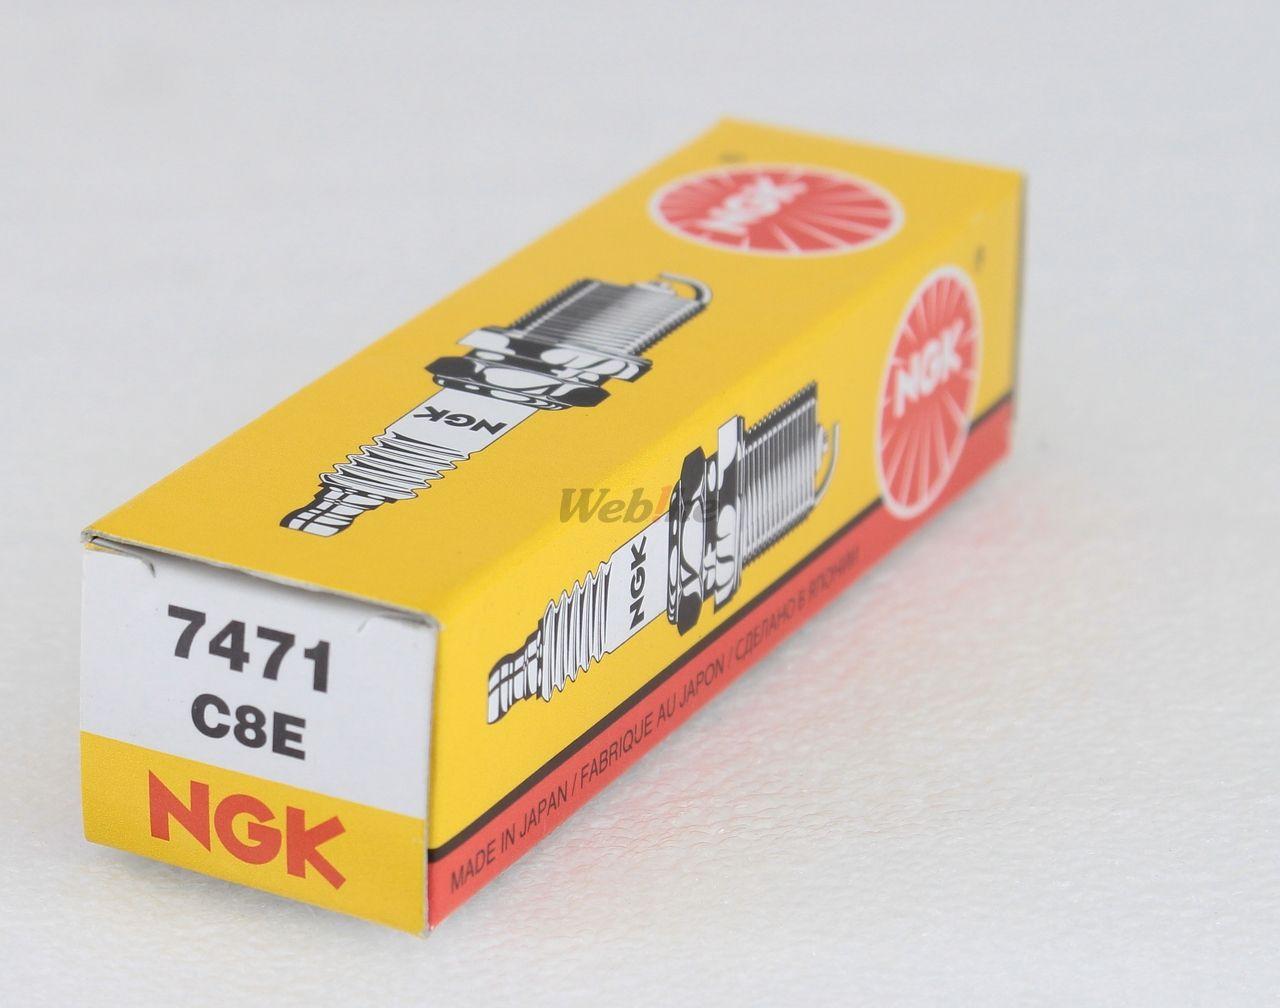 【NGK】標準型 火星塞 C8E 7471 - 「Webike-摩托百貨」